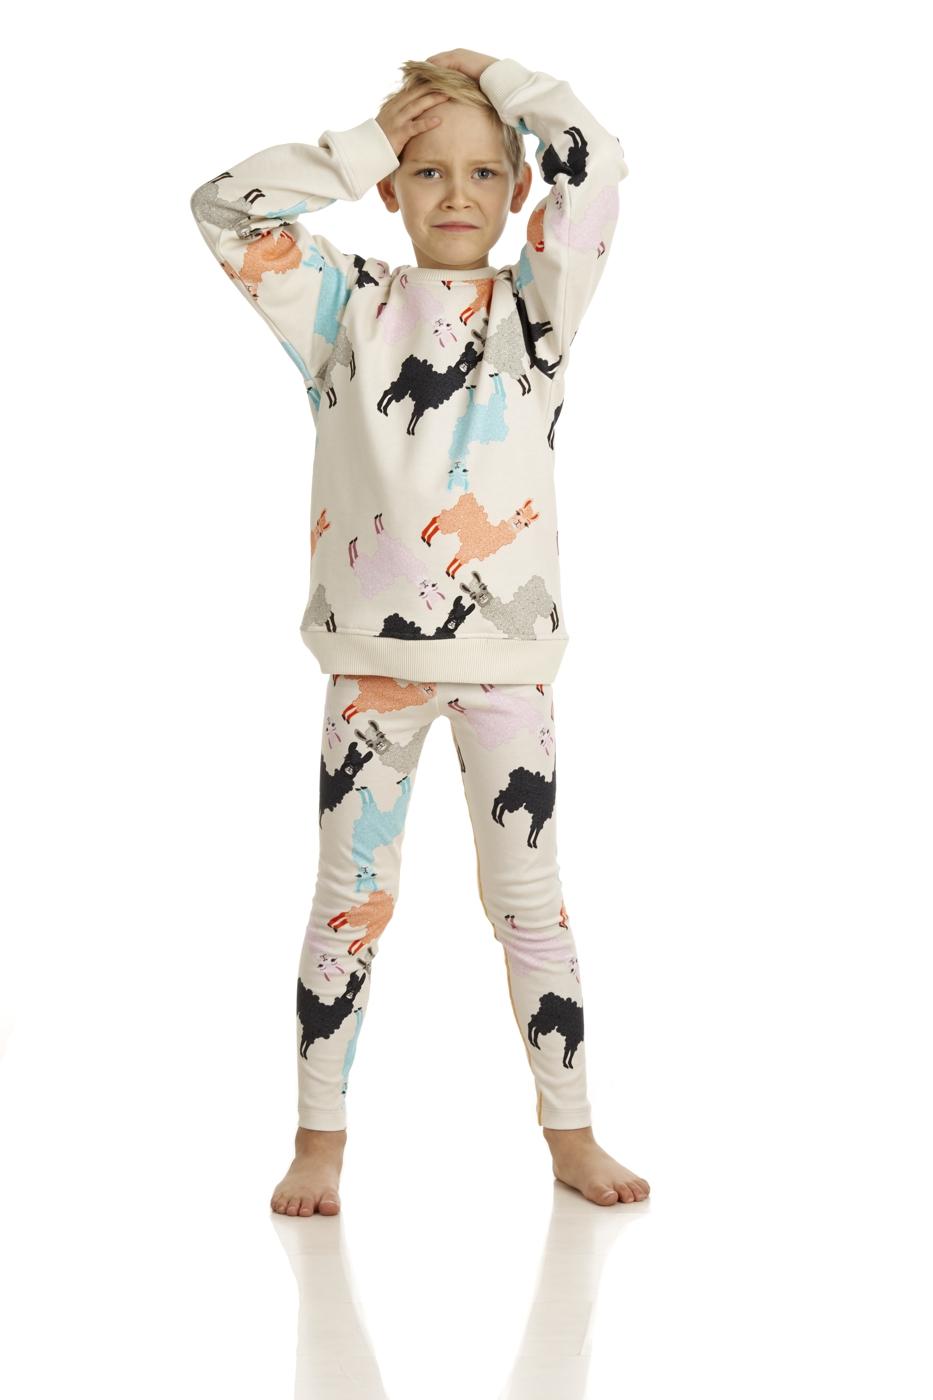 17SSSA Sweatshirt Alpaca 17SSLA Leggings Alpaca